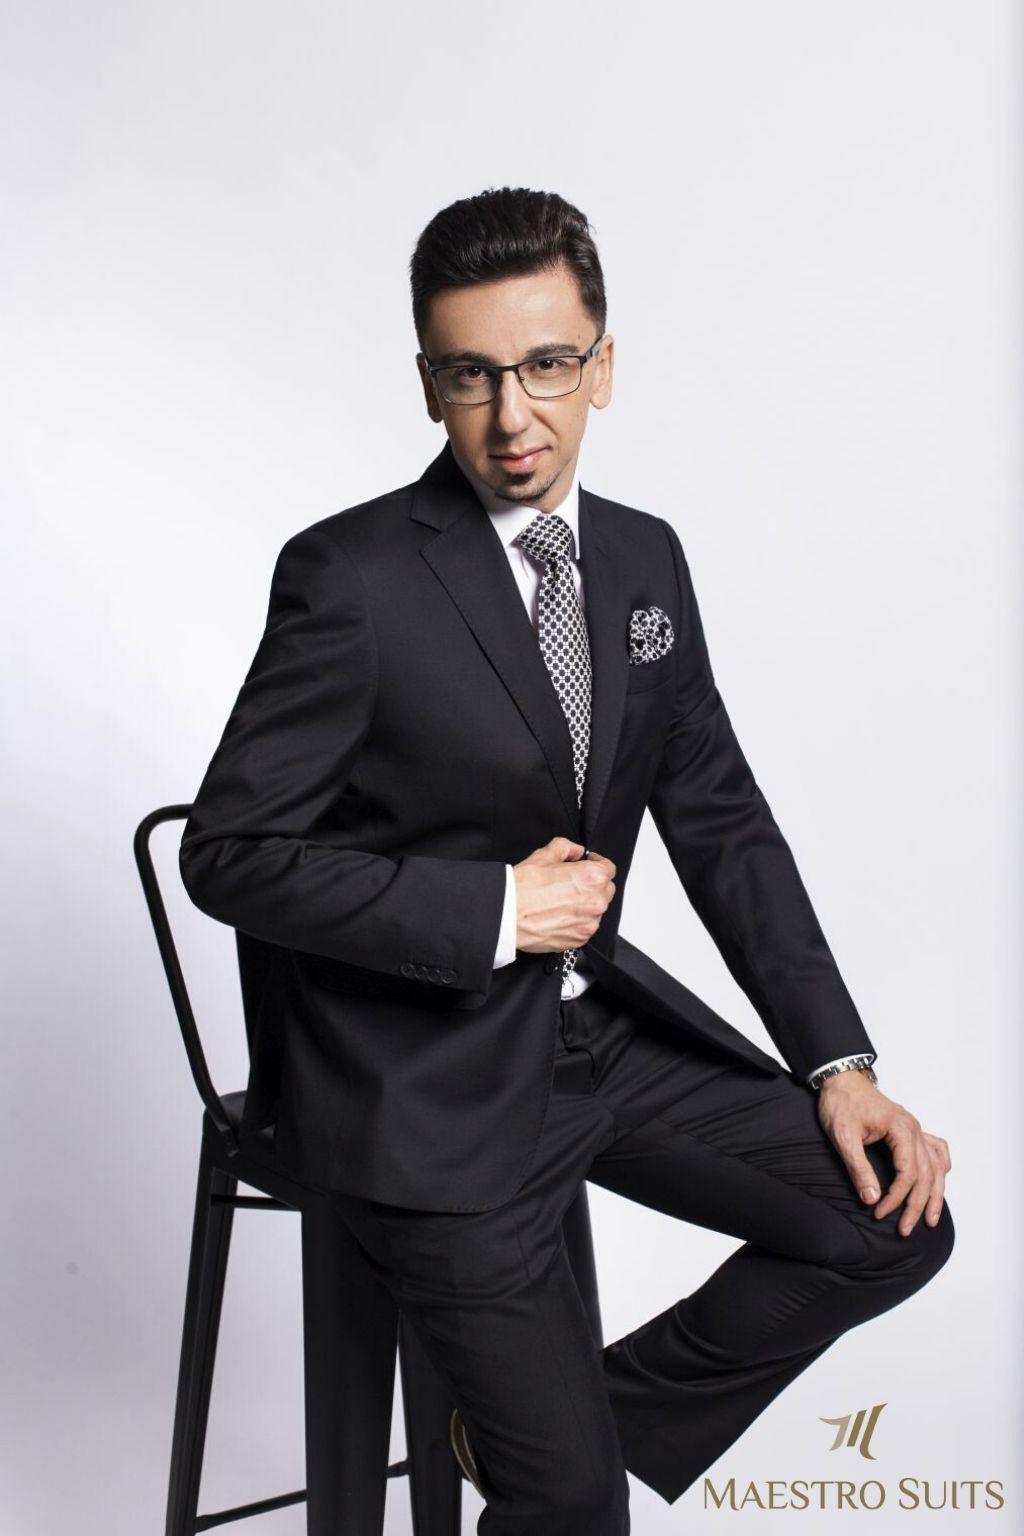 zvonko_komsic_maestro_suits (6)